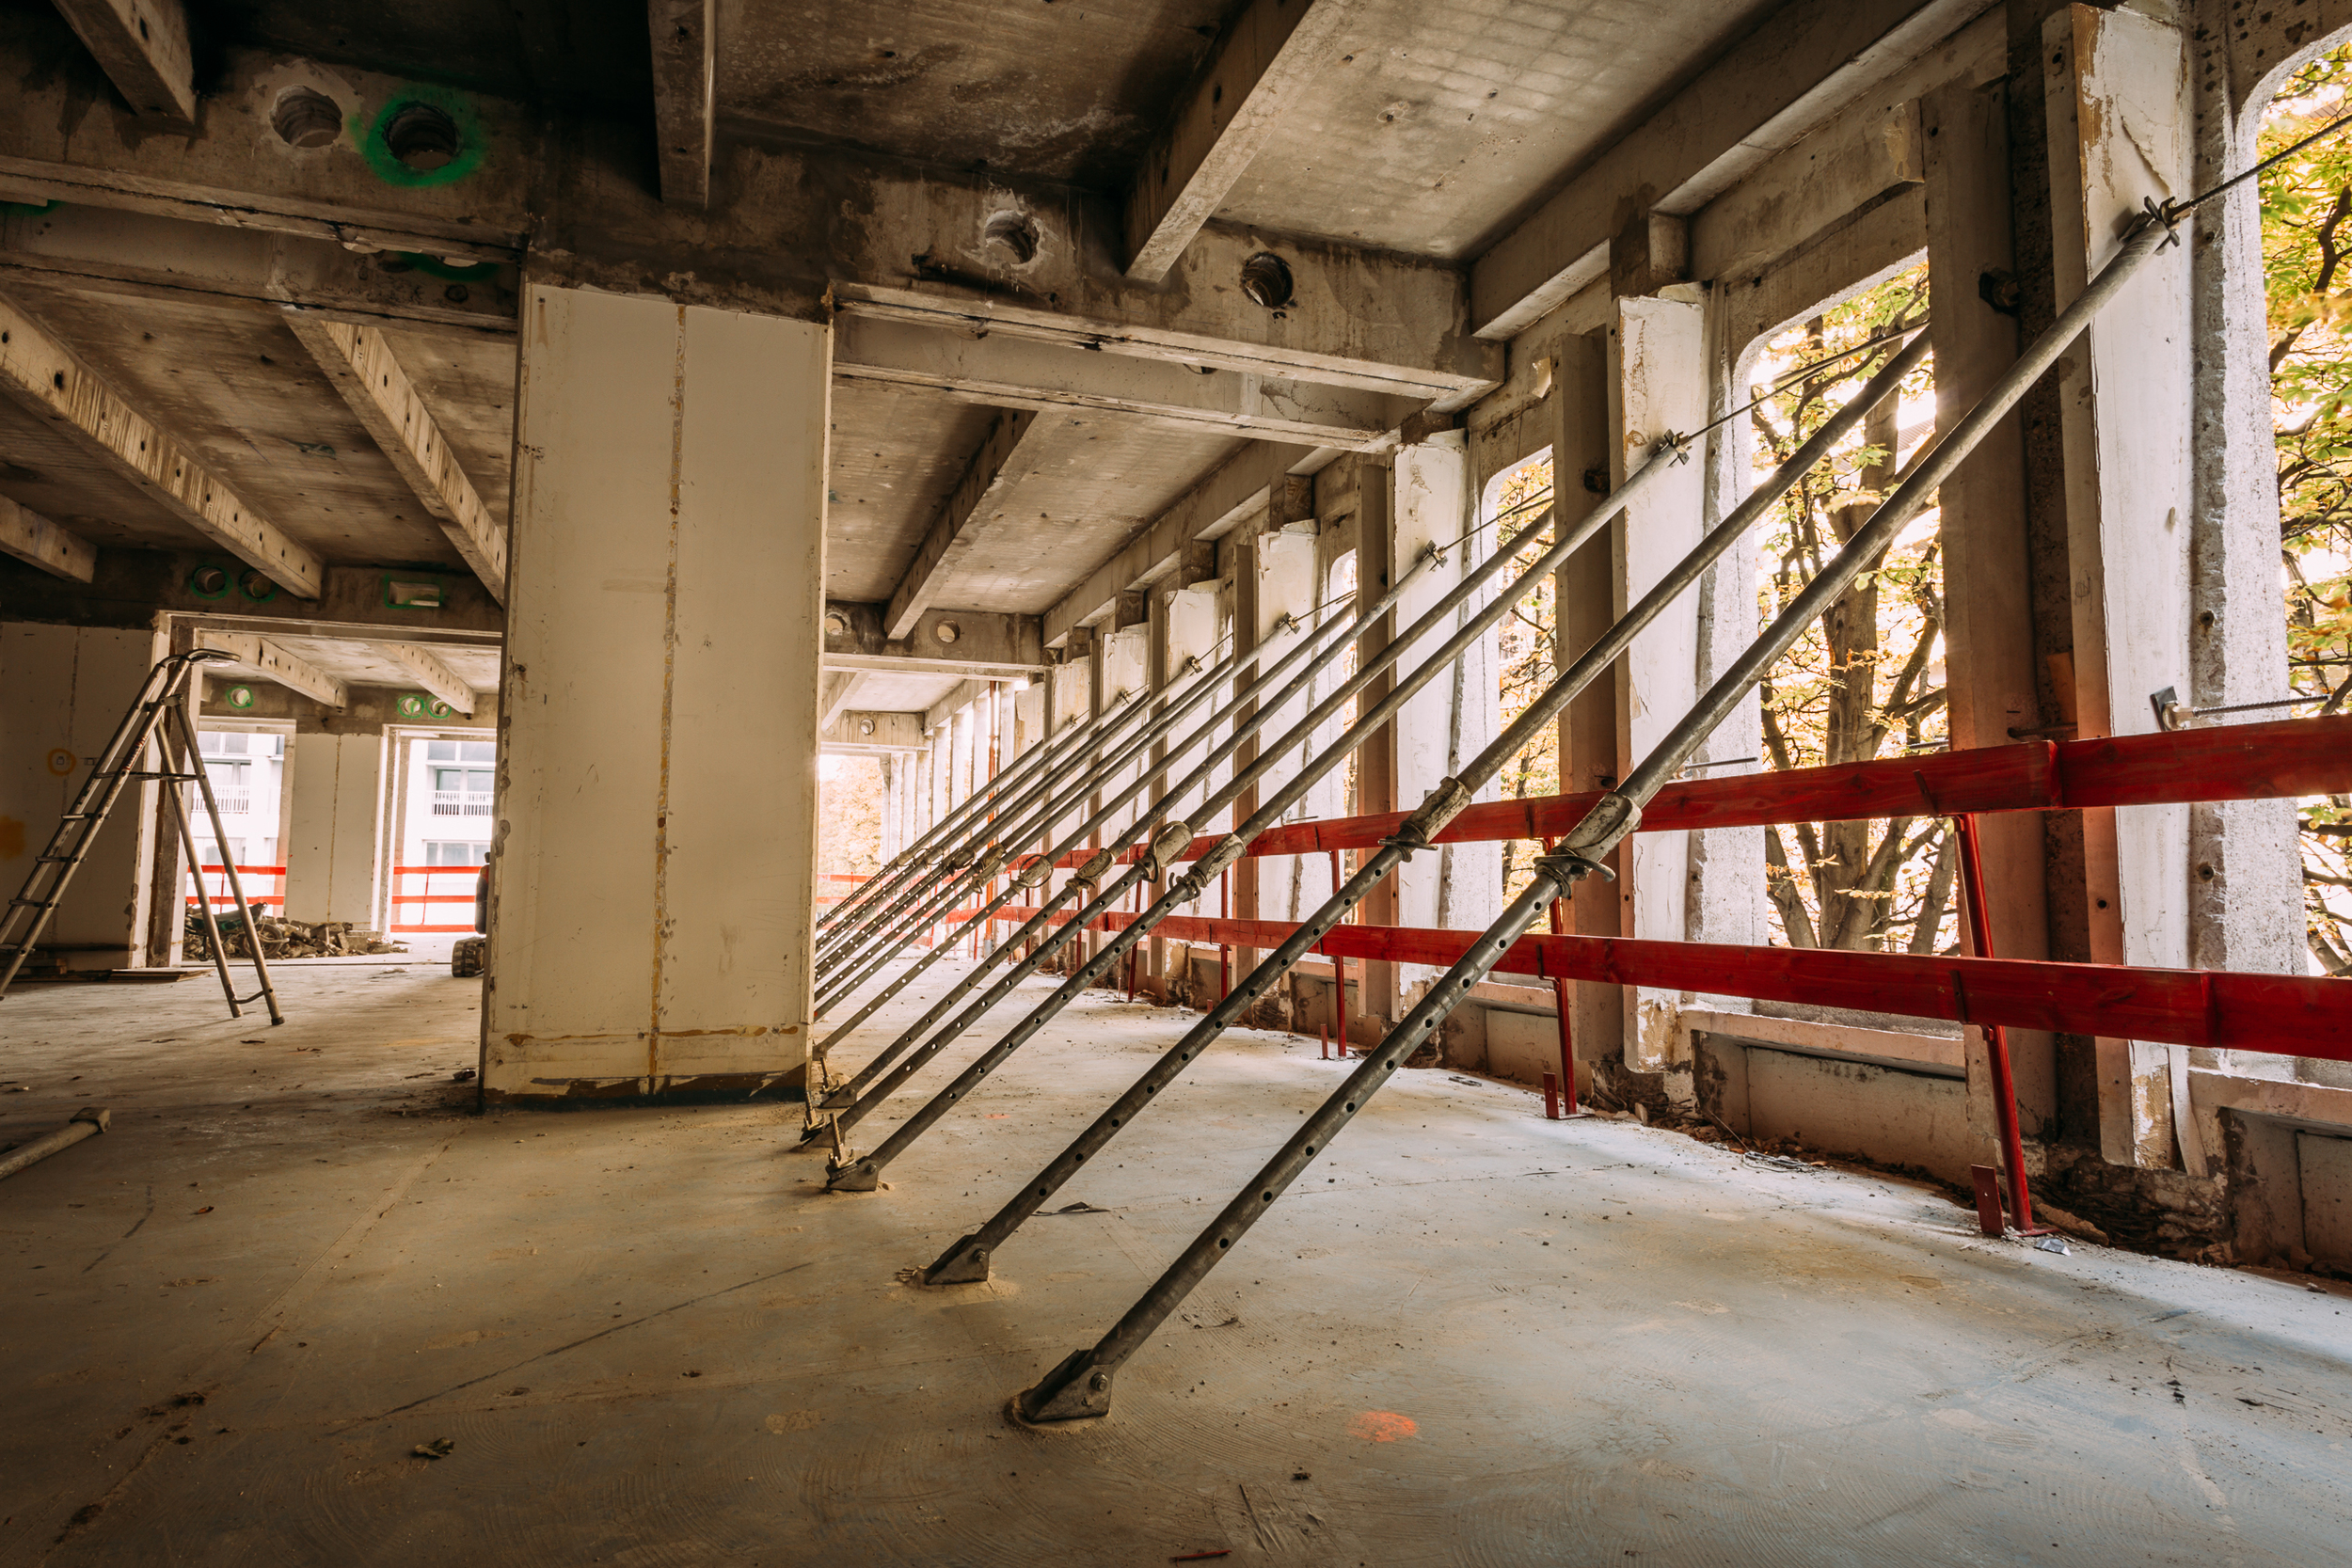 2015-10-12, Vivacity-Eiffage (chantier)-112.jpg